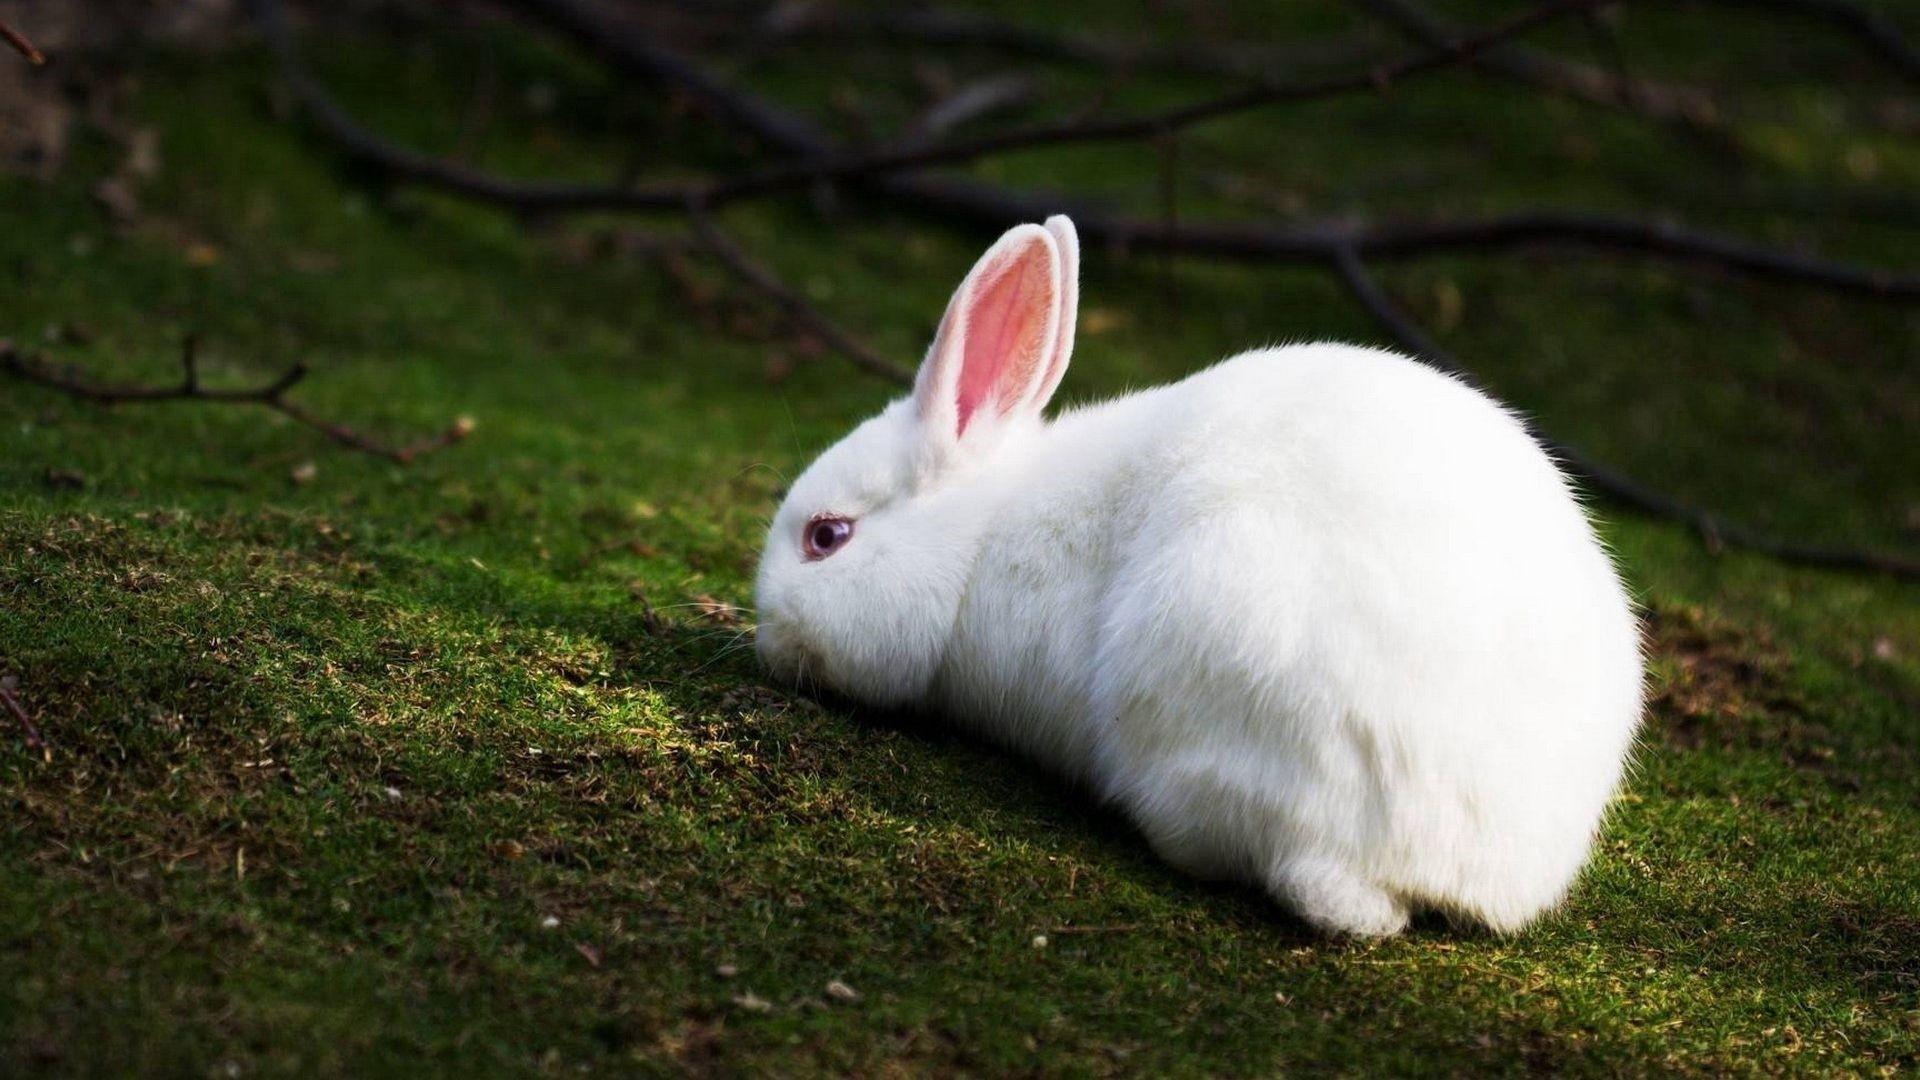 Bunny Background